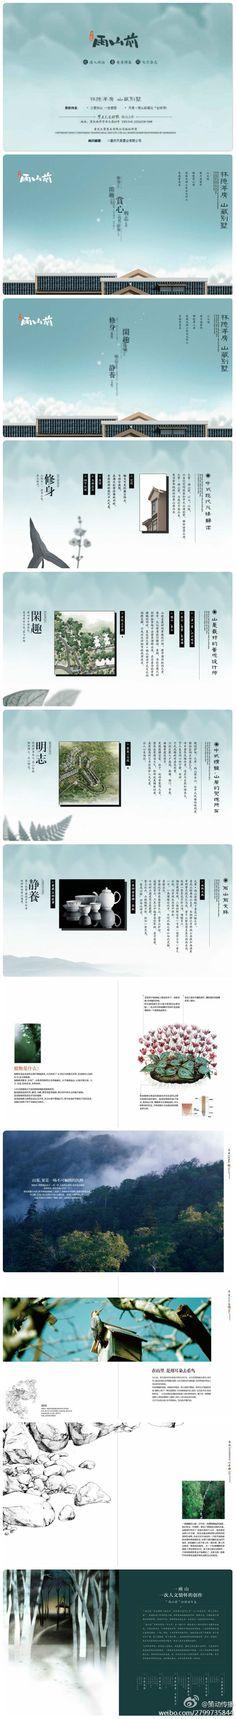 Beautiful Chinese graphic design & advertising http://www.weibo.com